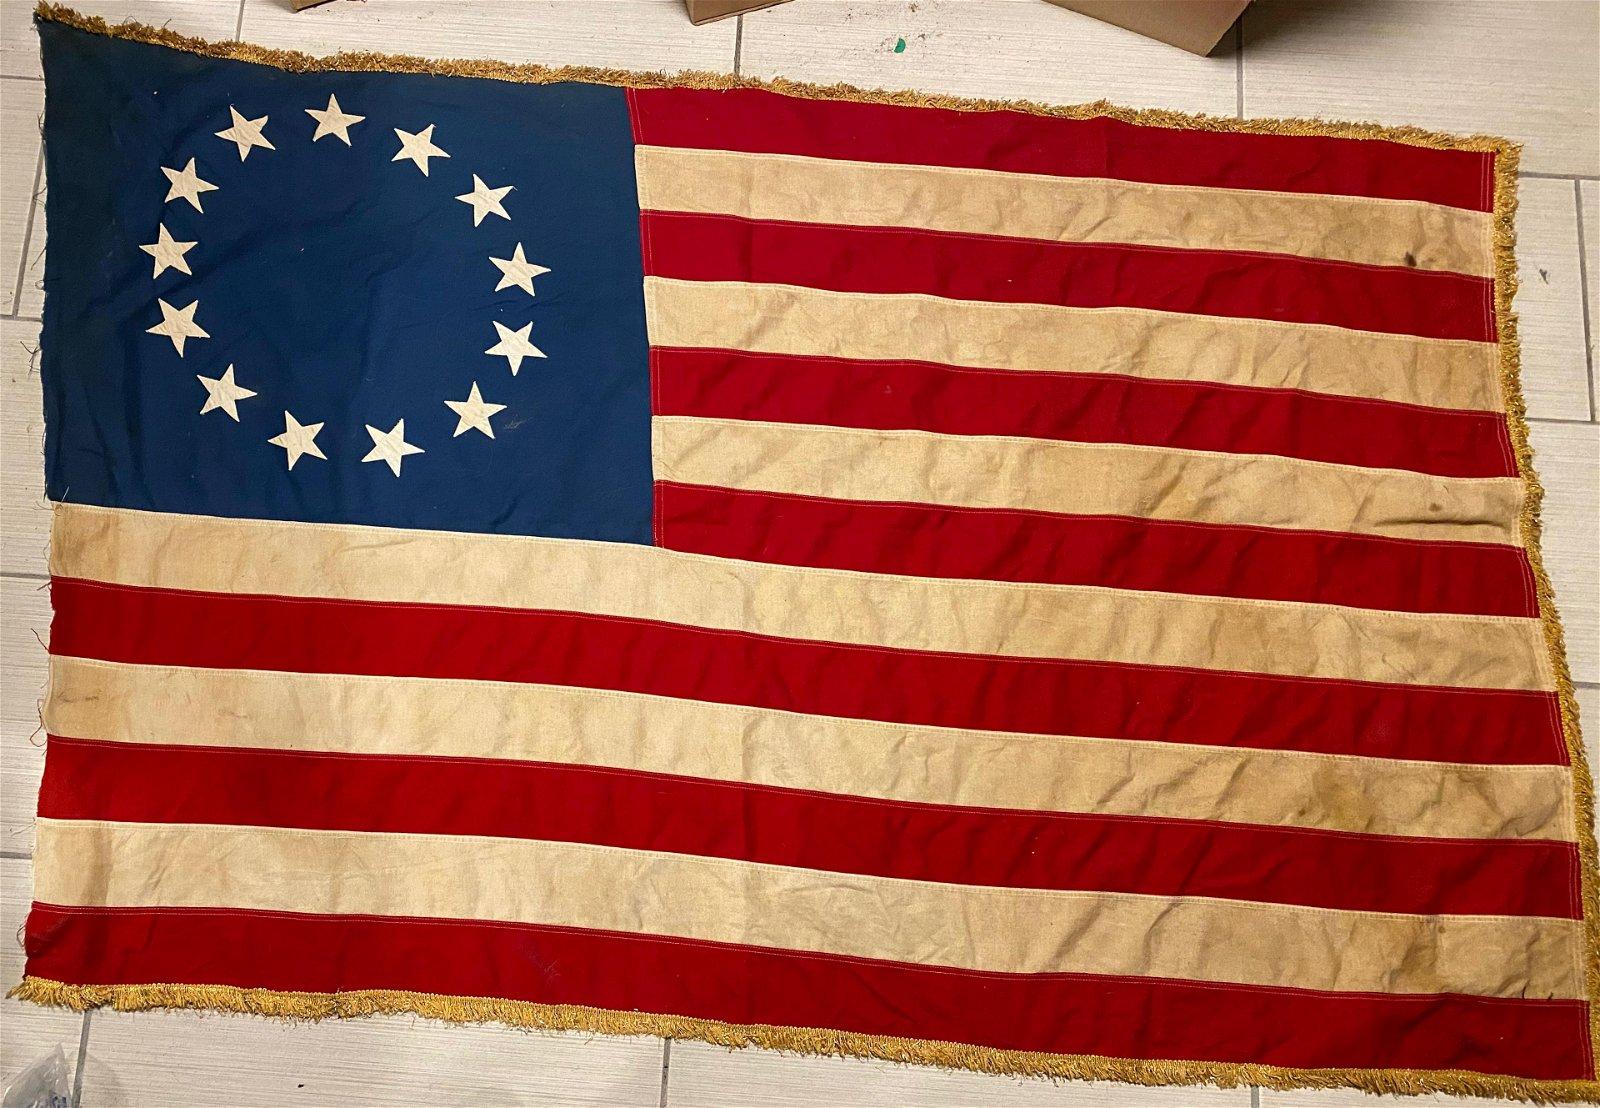 CIVIL WAR 13 STAR CONFEDERATE FLAG W/ GOLD BULLION